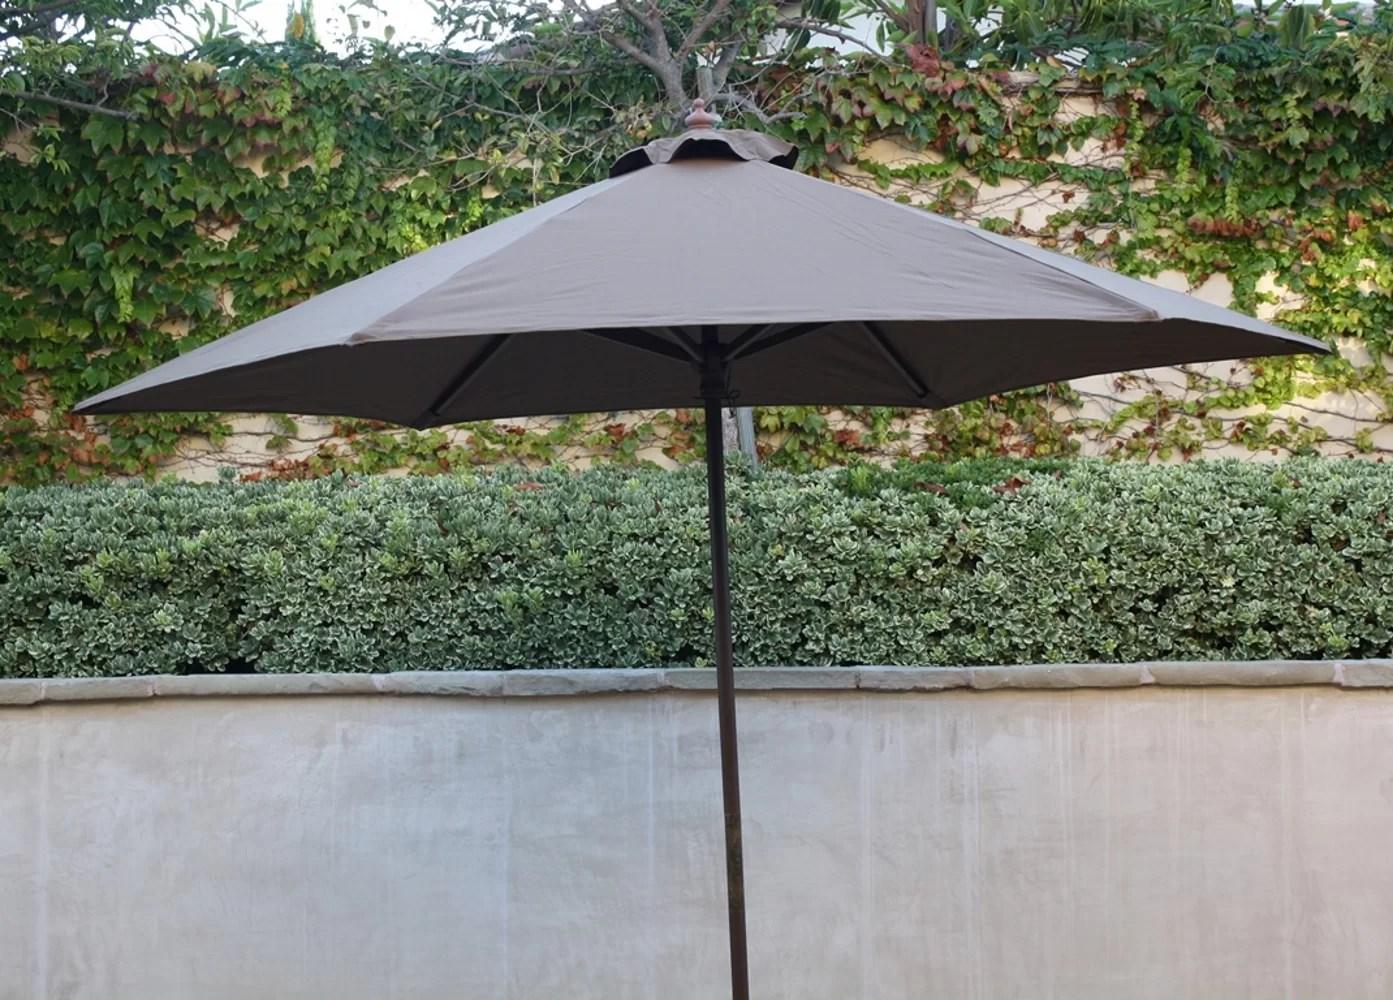 market patio umbrella 6 rib replacement cover